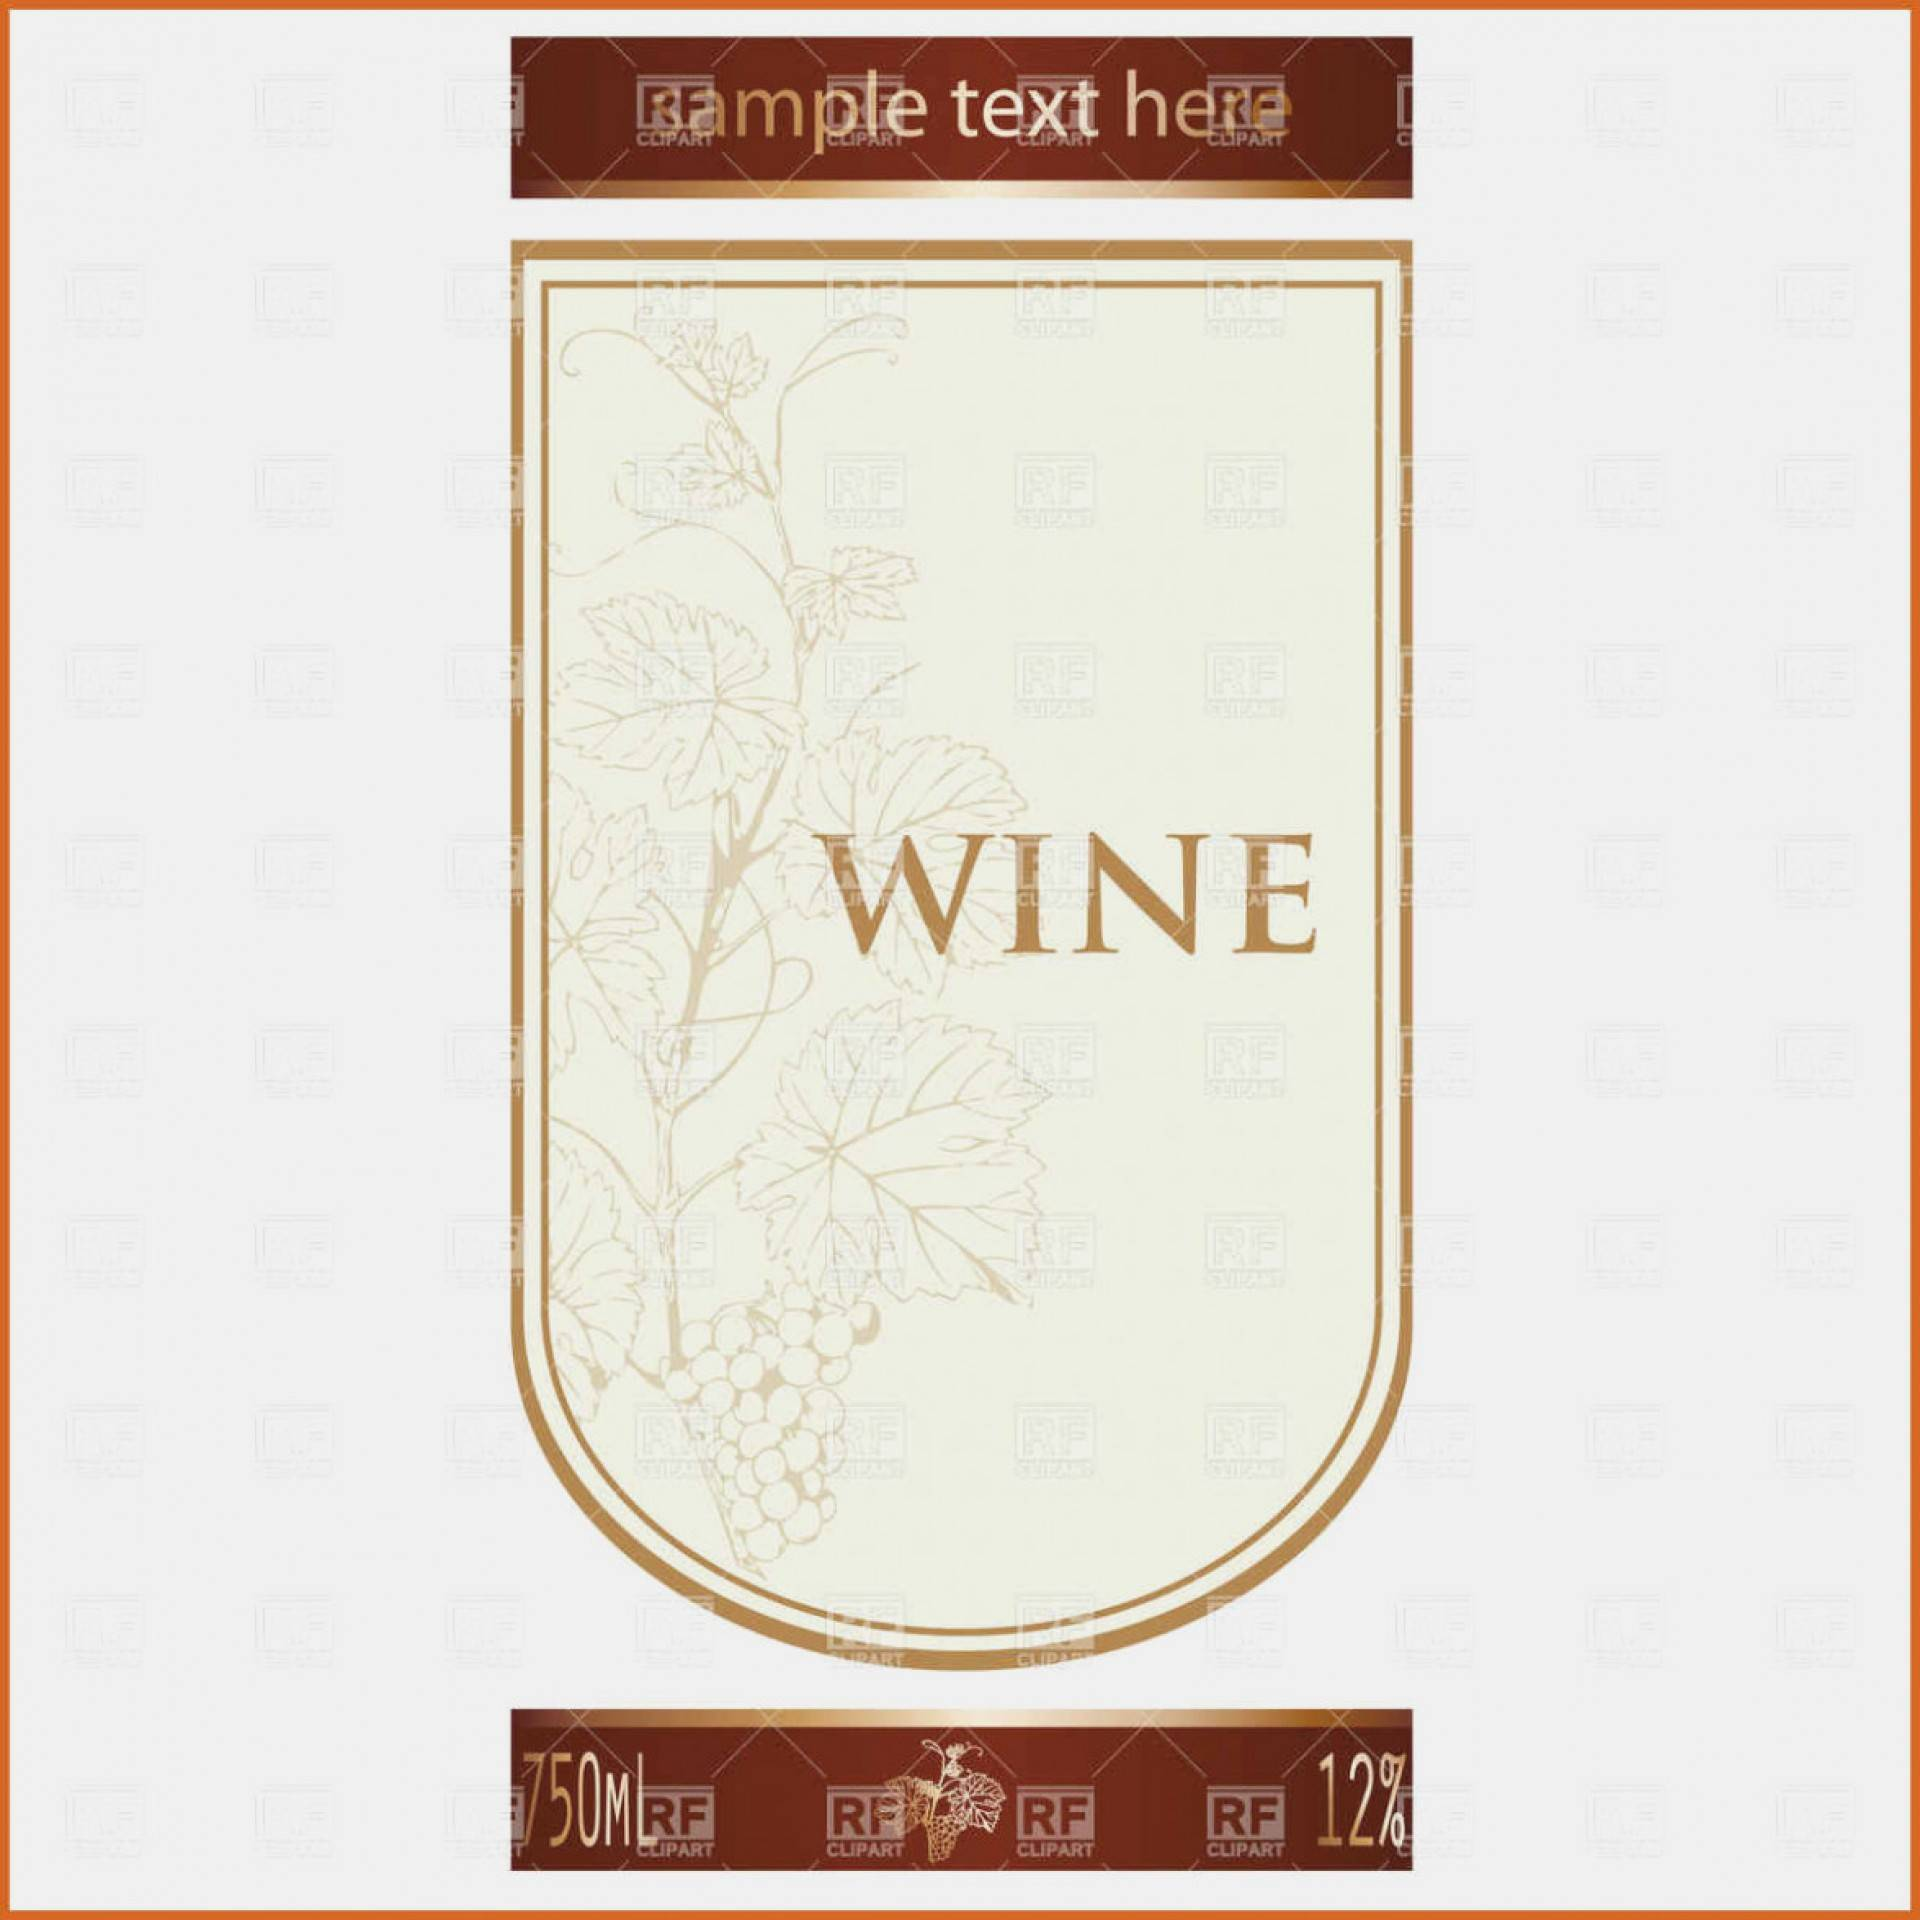 Wine Bottle Label Template Microsoft Word